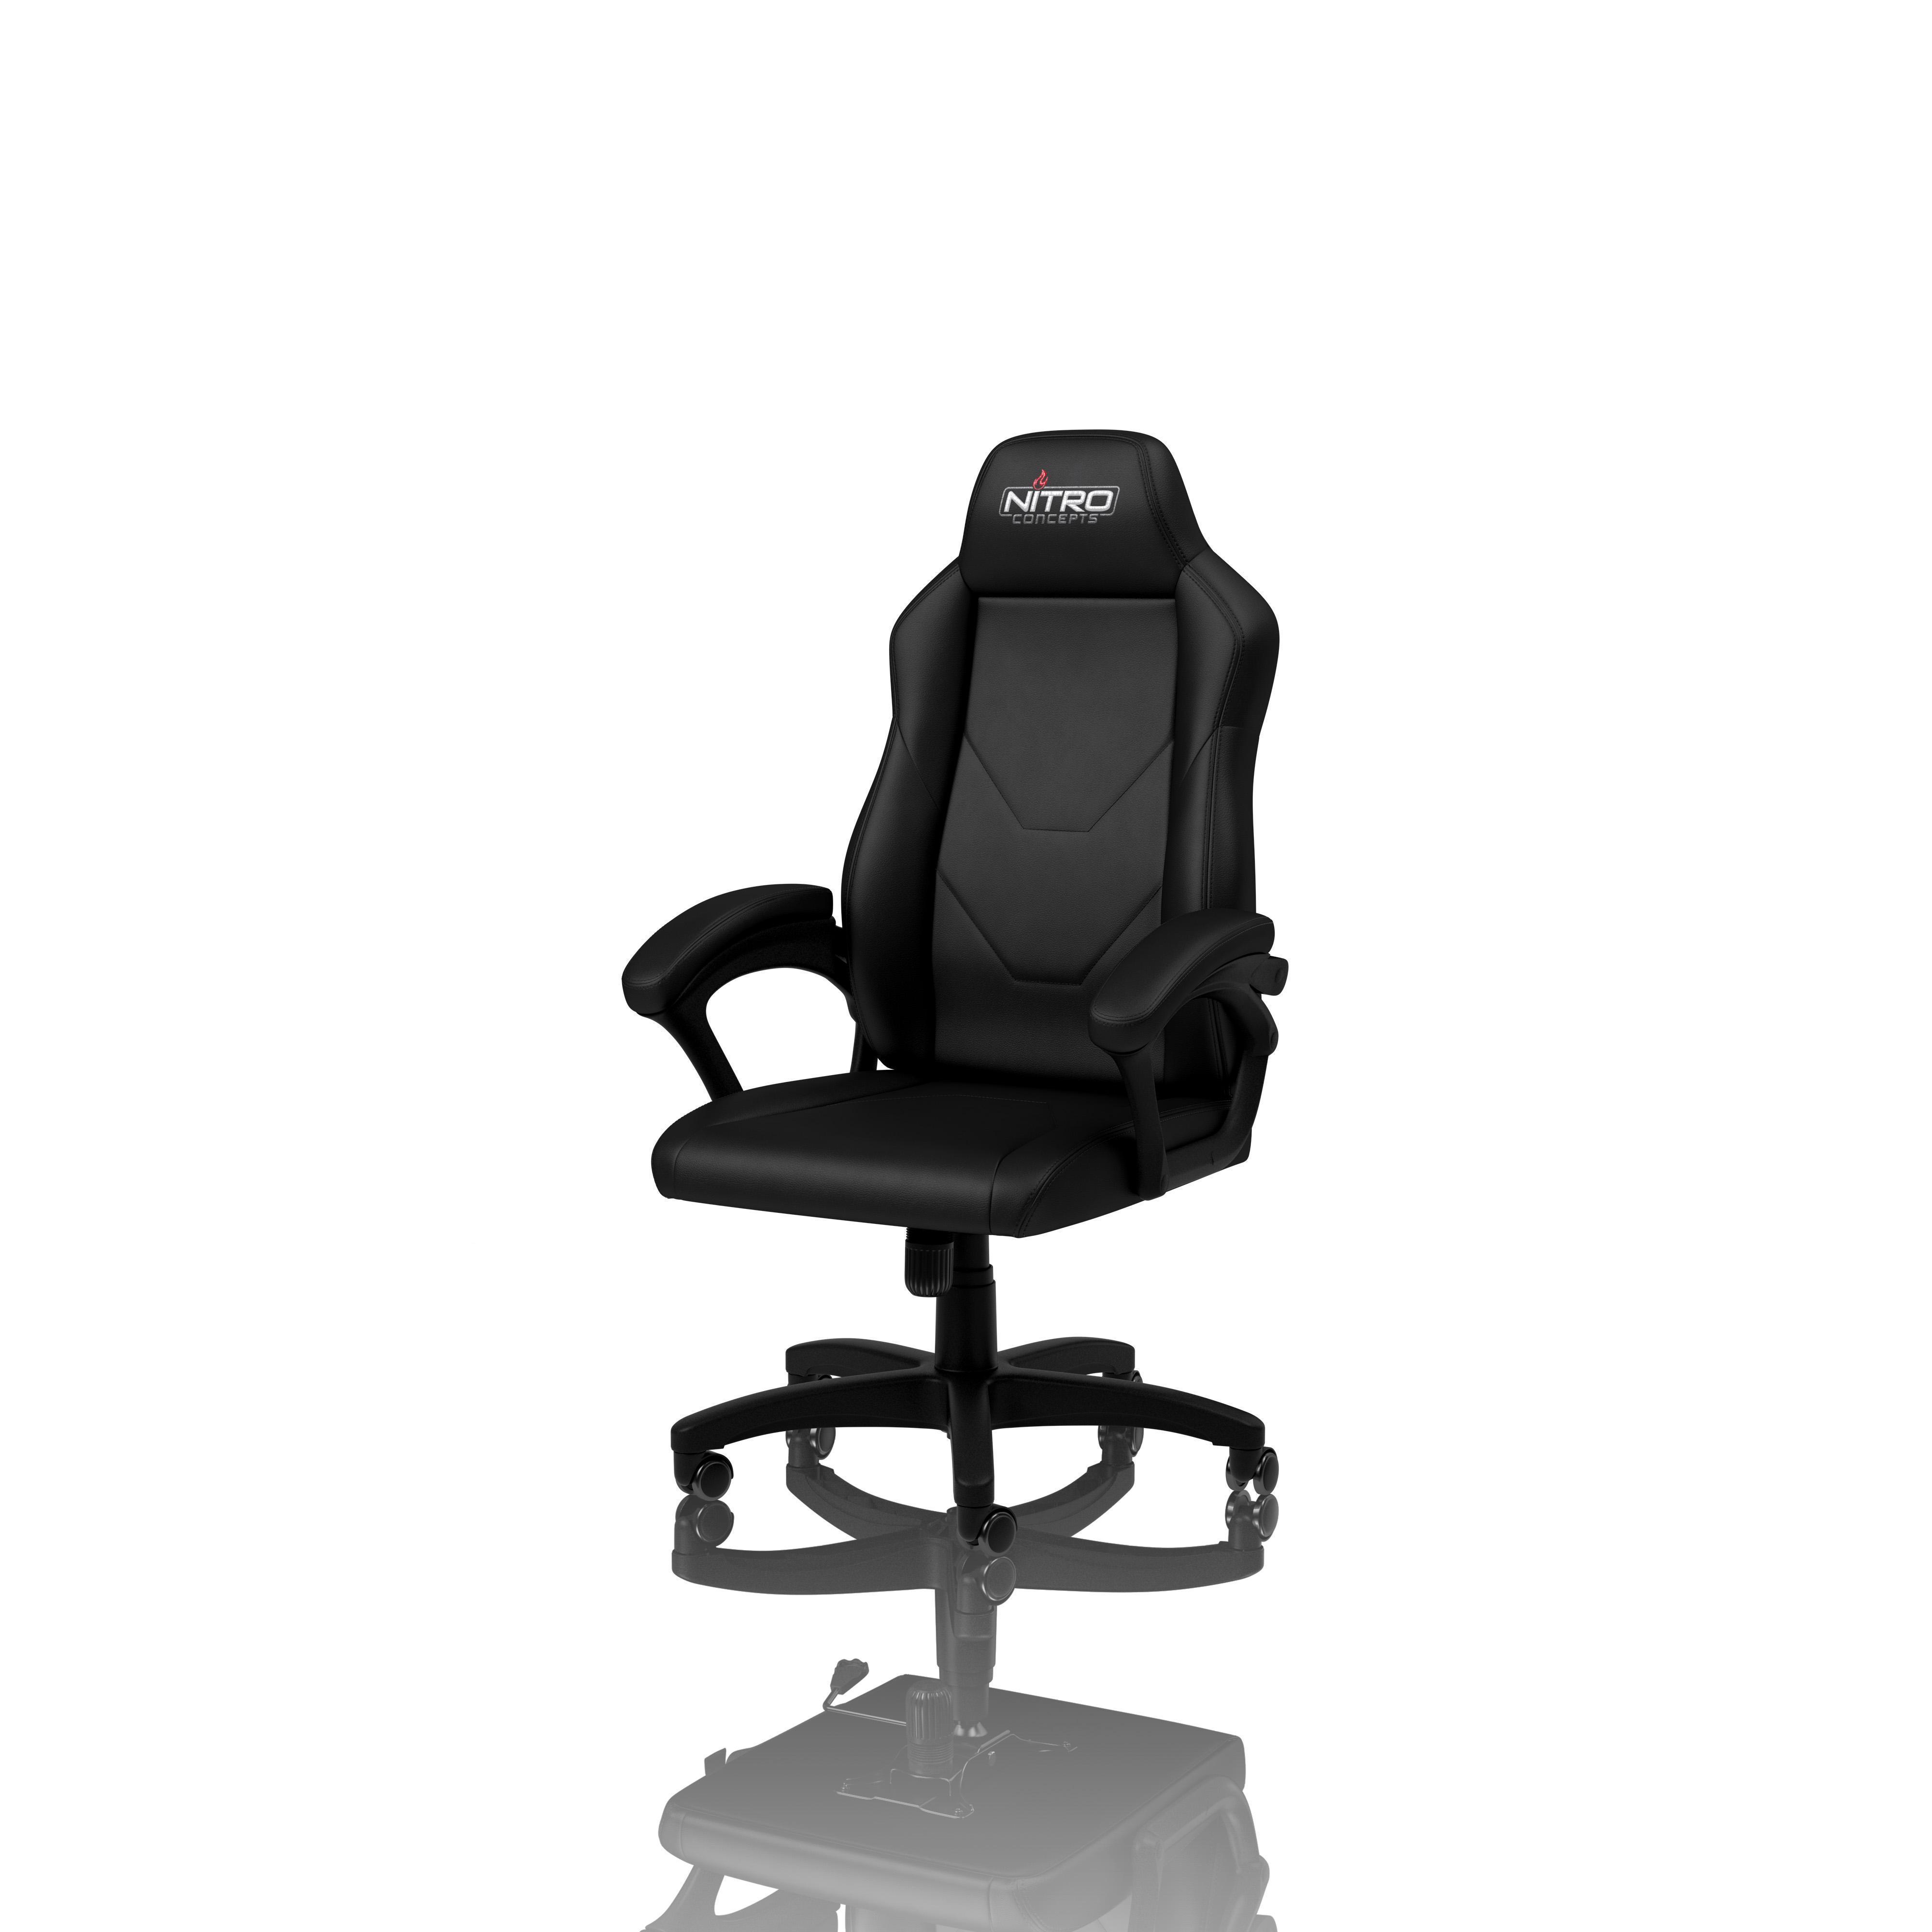 Nitro Concepts C100 Gaming Chair Black Novatech